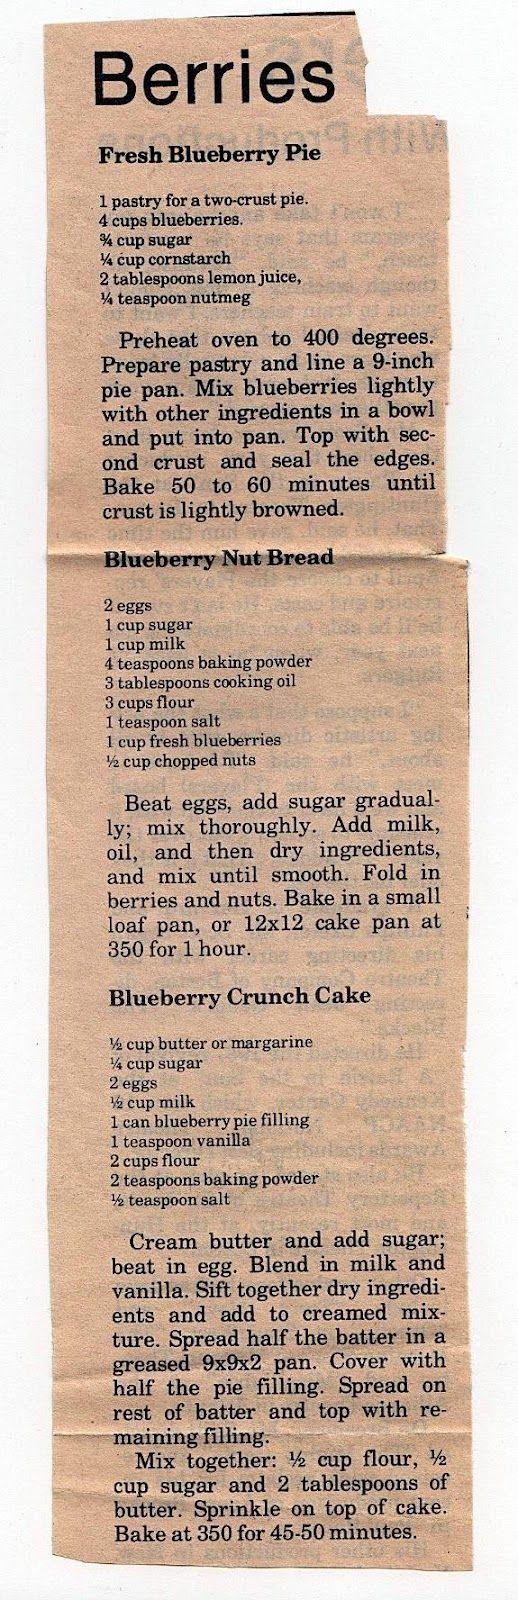 Blueberry Recipes: